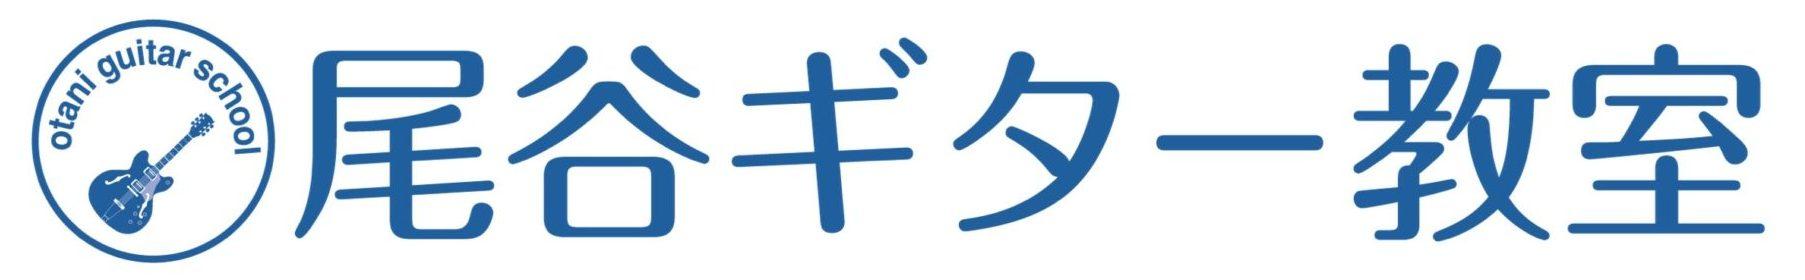 草加/越谷/谷塚 尾谷ギター教室